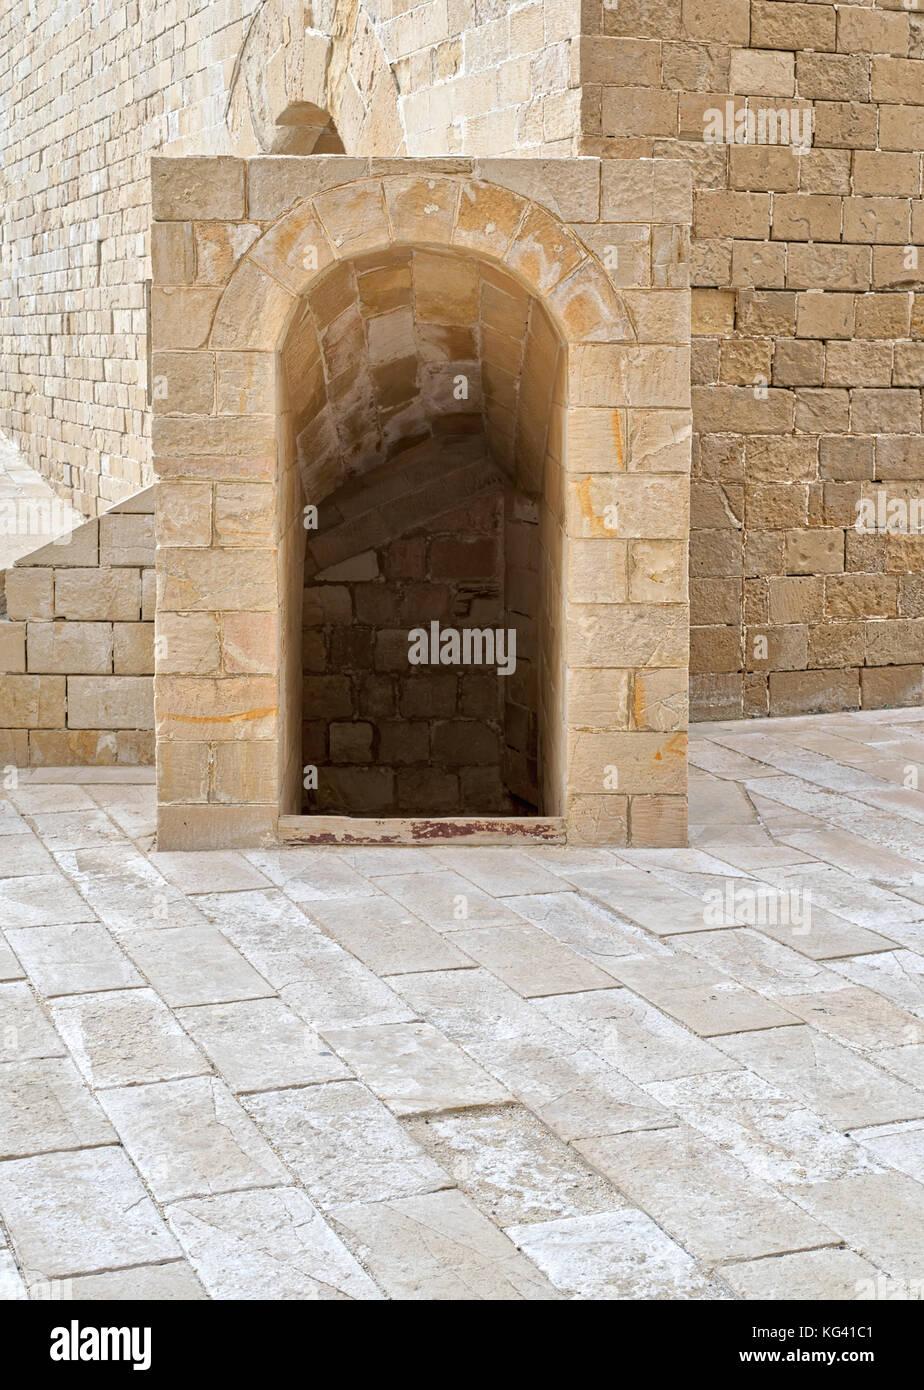 Ancient crypt entrance, bricks stone wall and tiled stone floor beside Kayet bay castle, Alexandria, Egypt - Stock Image